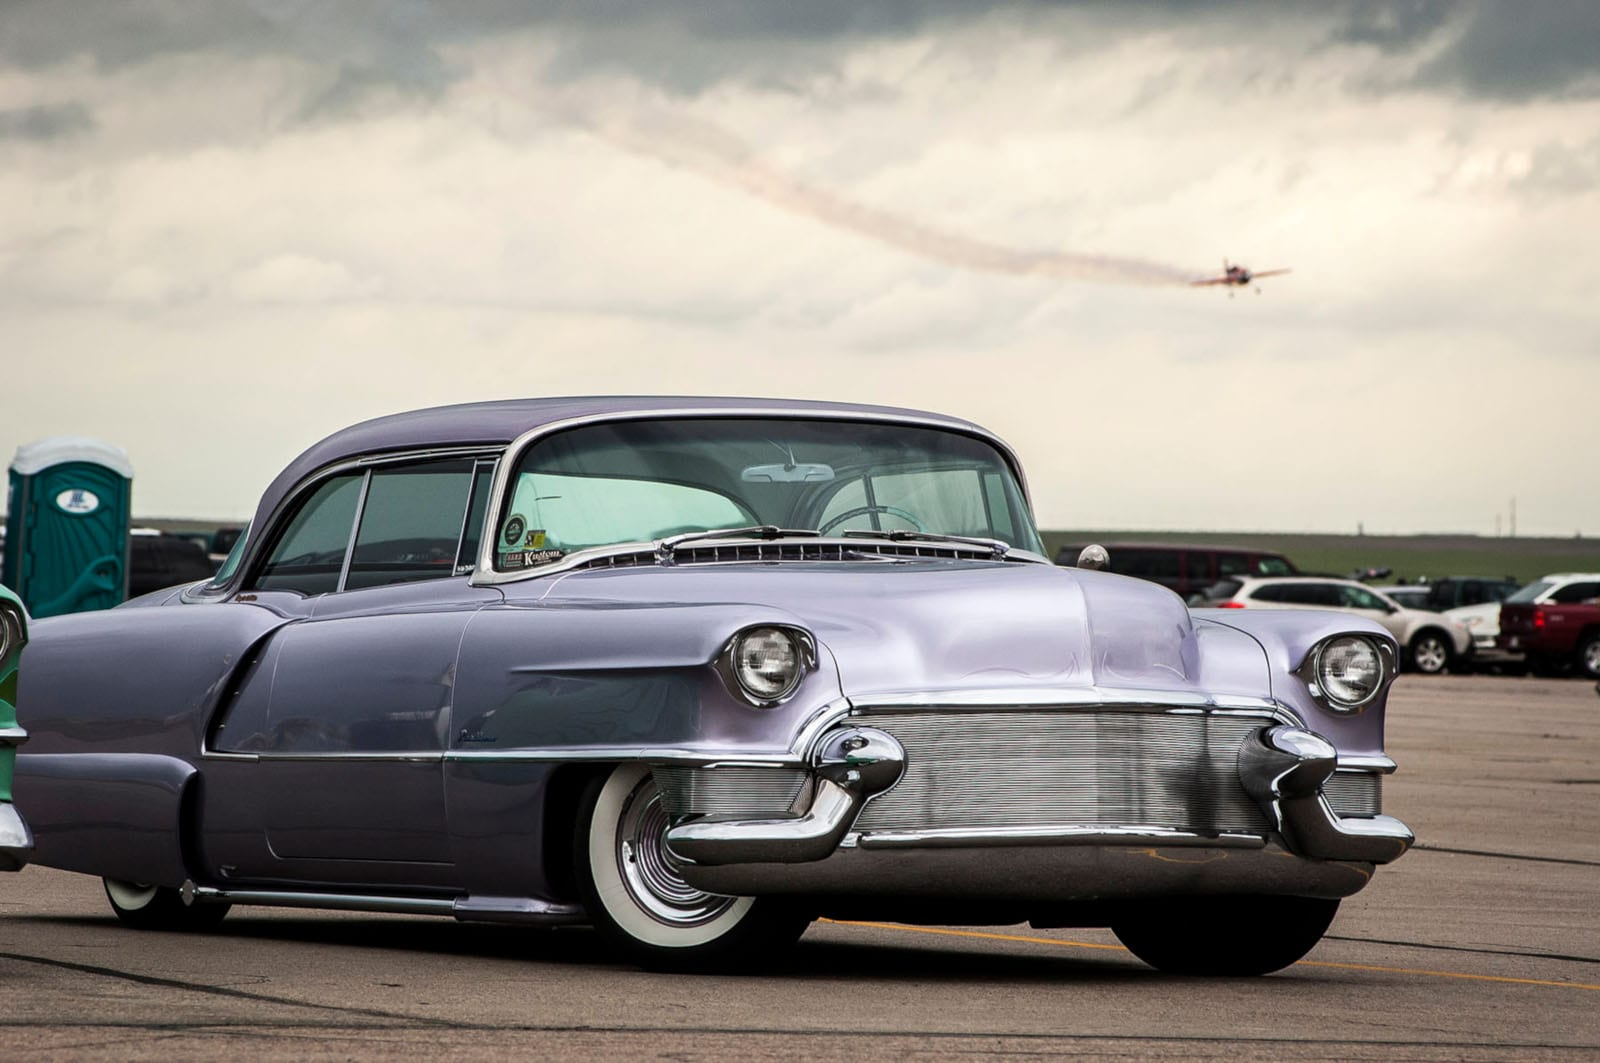 WarBird Auto Classic Watkins CO Purple Vintage Show Car